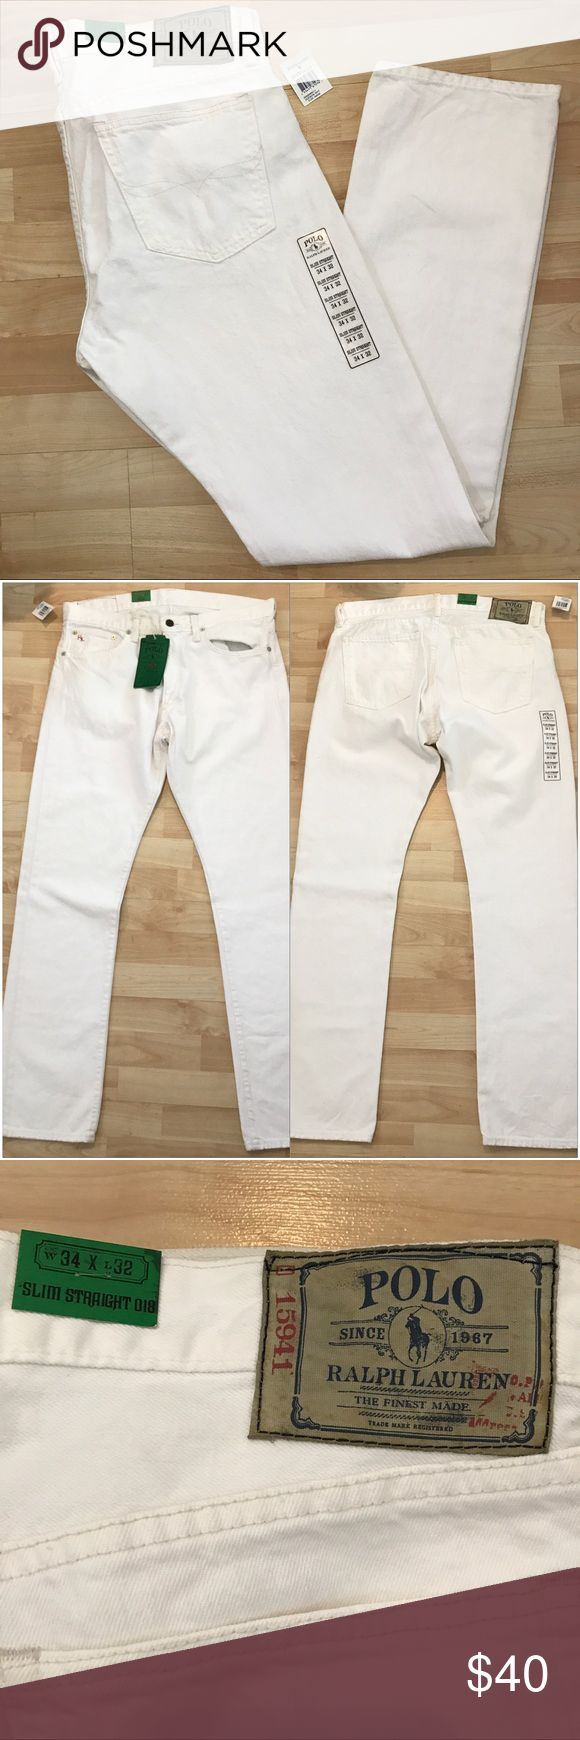 Polo Ralph Lauren men's white jeans Polo Ralph Lauren men's white jeans. Brand new with tags. Size: 34x32 slim Straight. Polo by Ralph Lauren Jeans Slim Straight